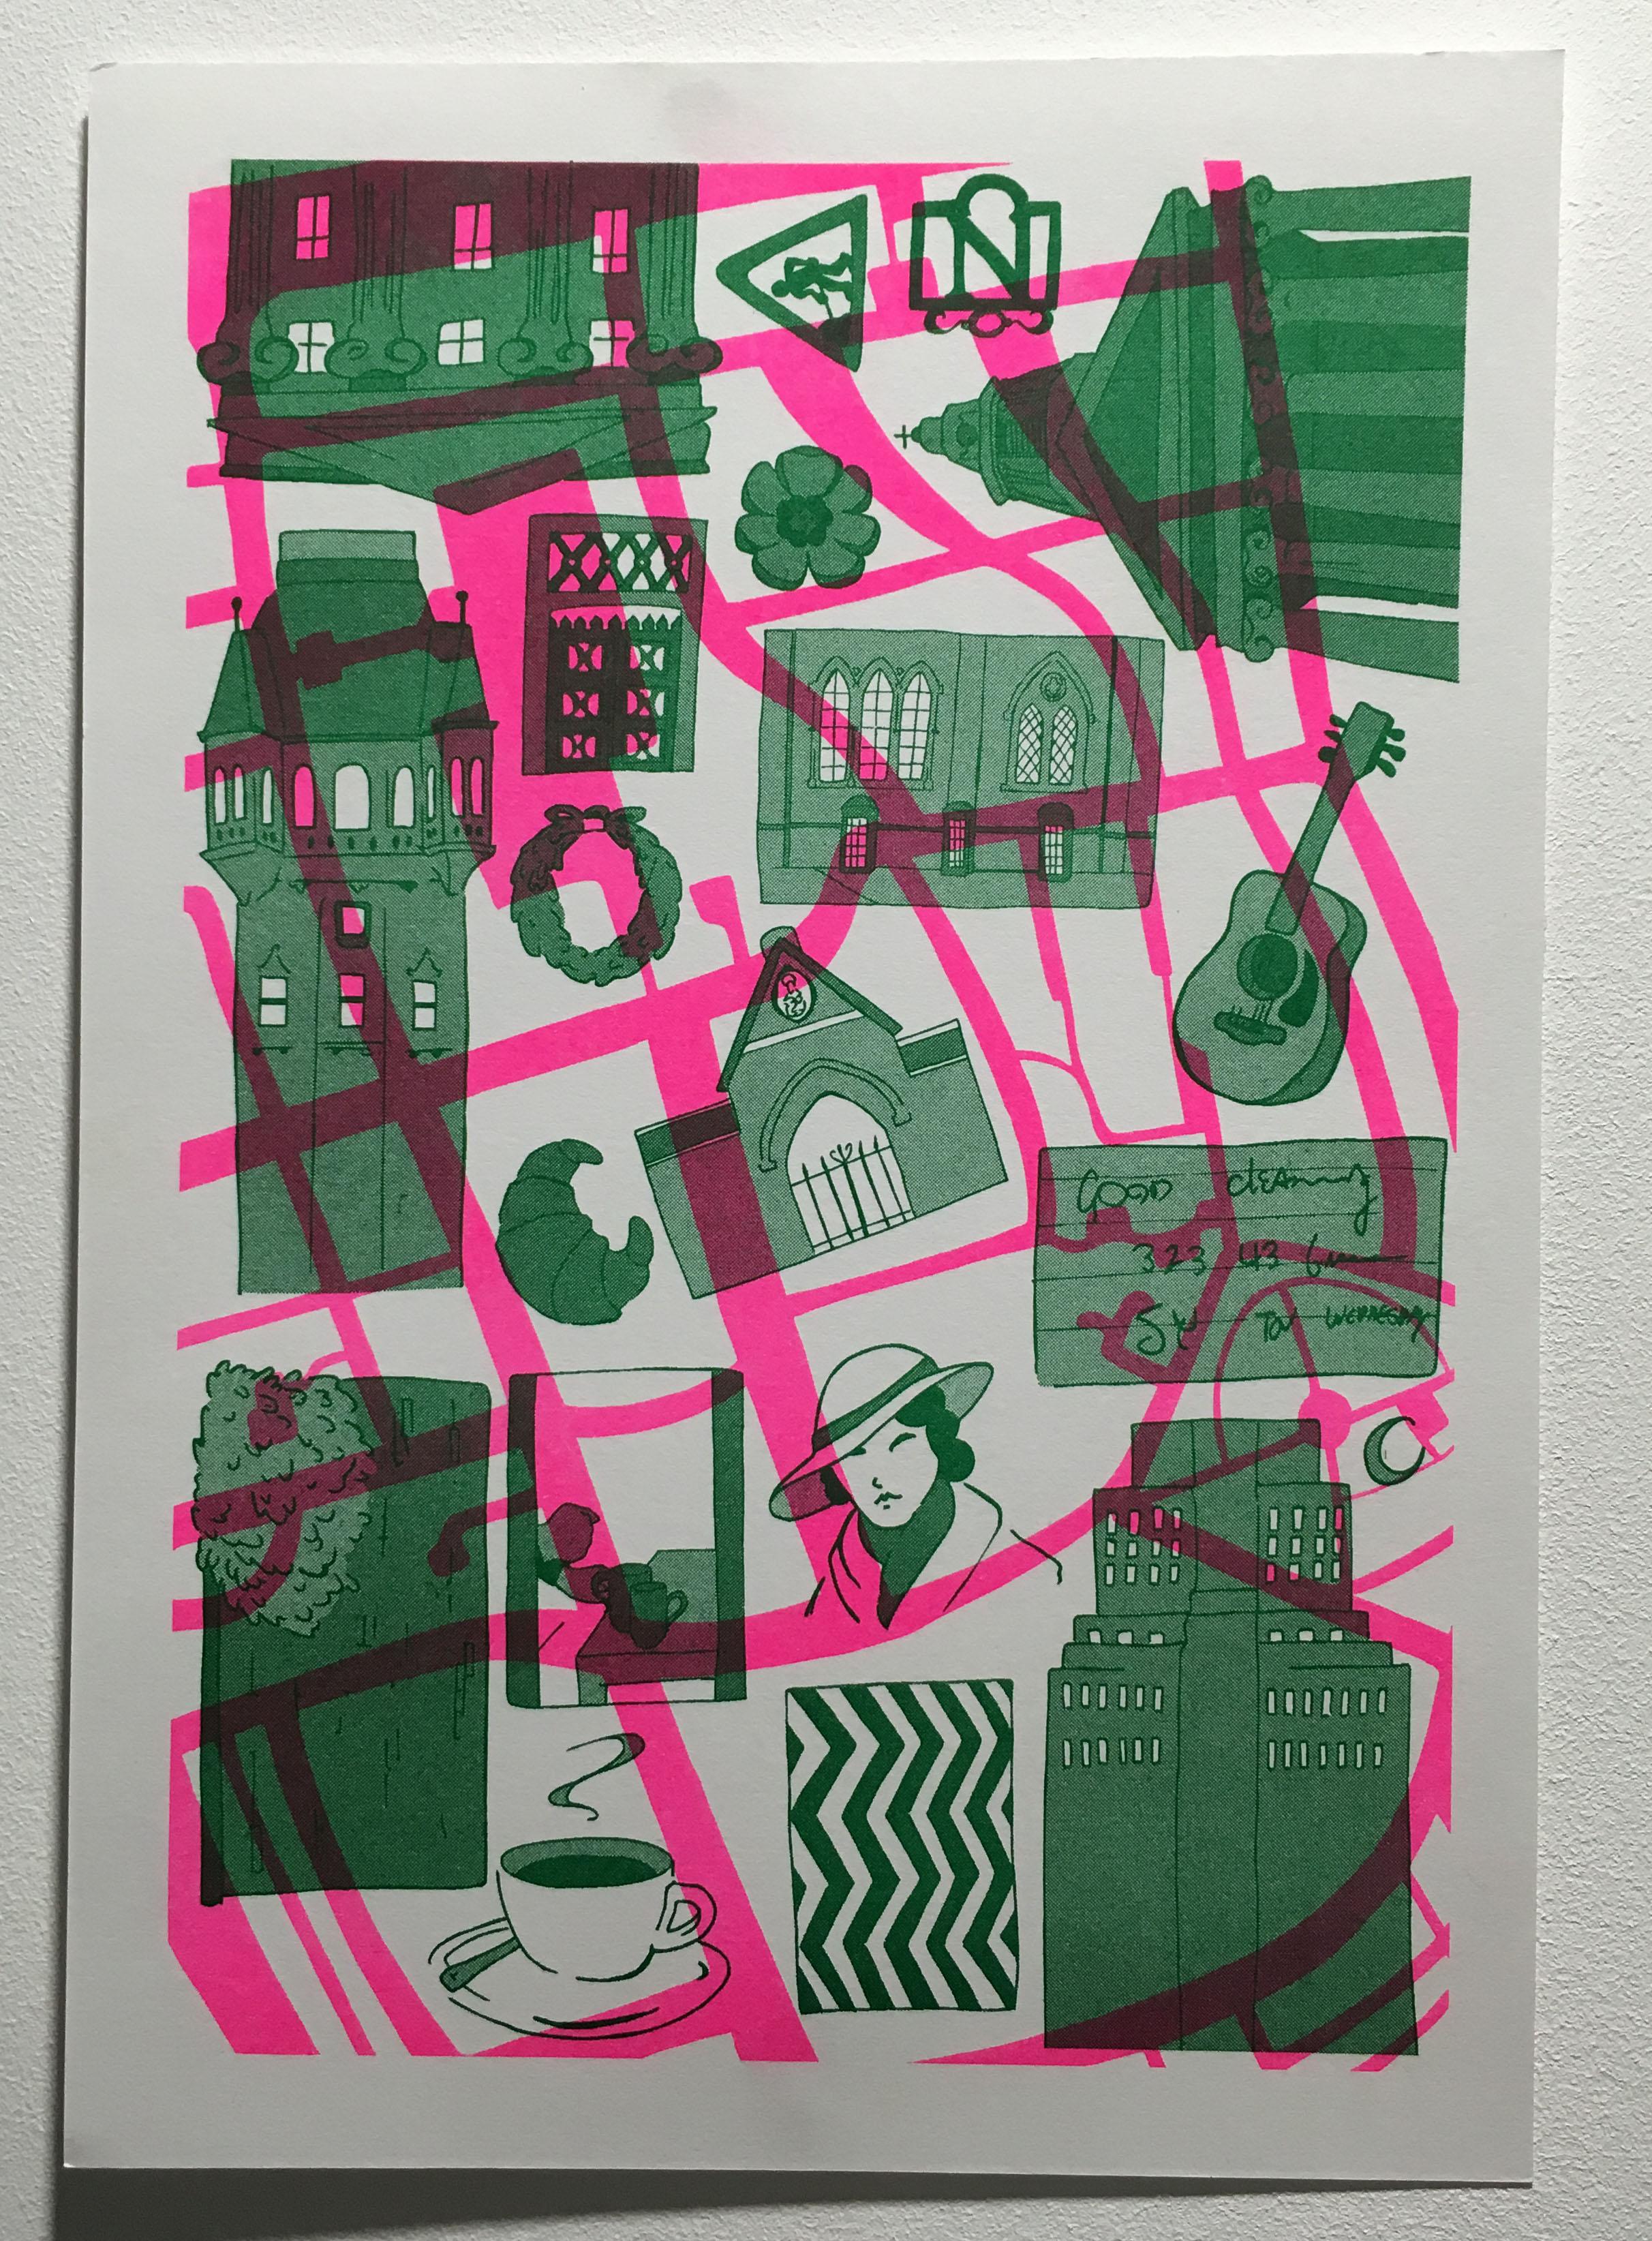 'Bloomsbury', final piece by Rafael Zugliani